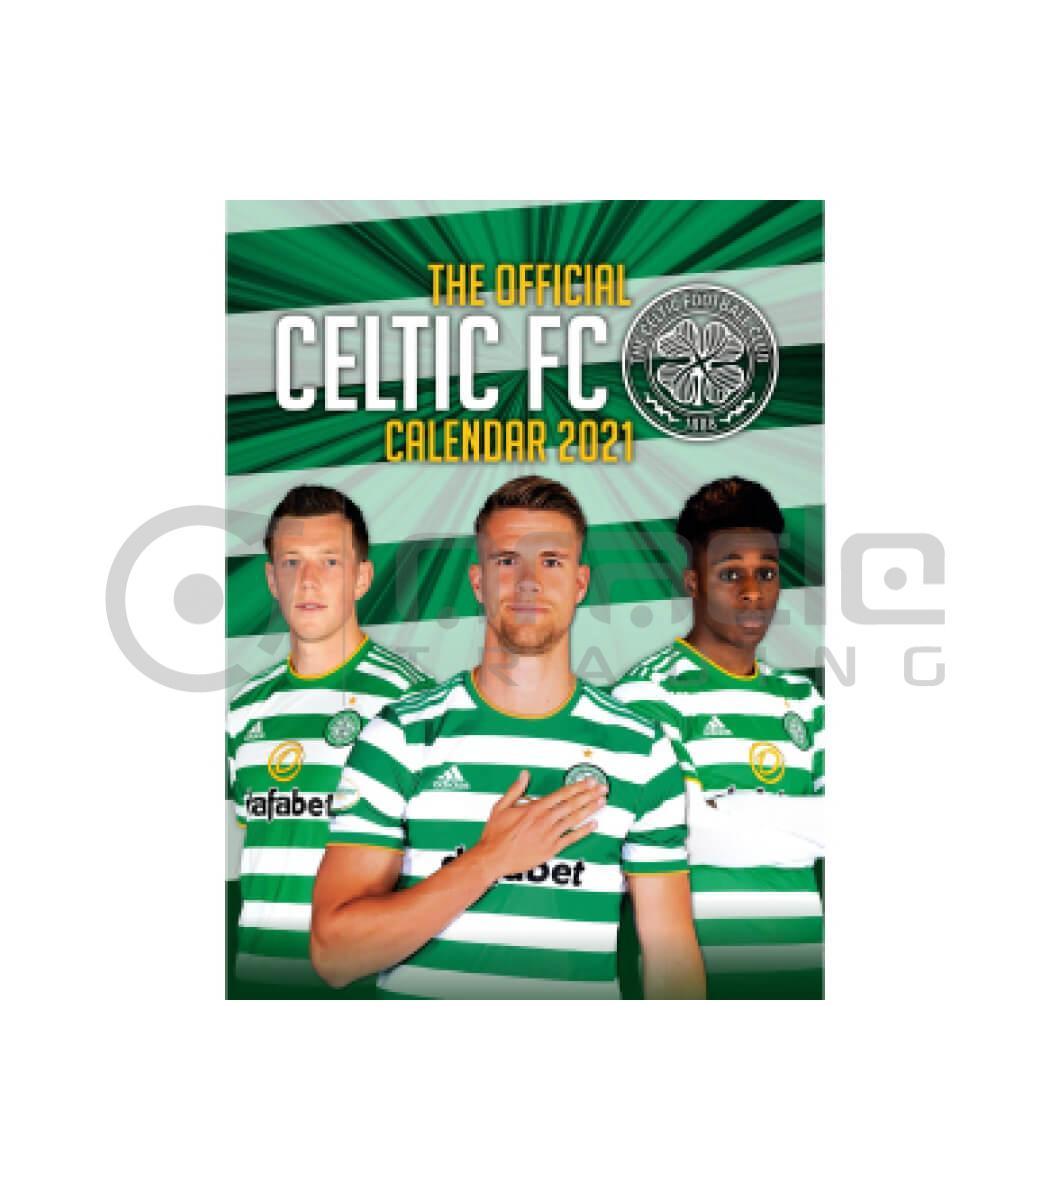 Celtic 2022 Calendar (NOV Delivery)